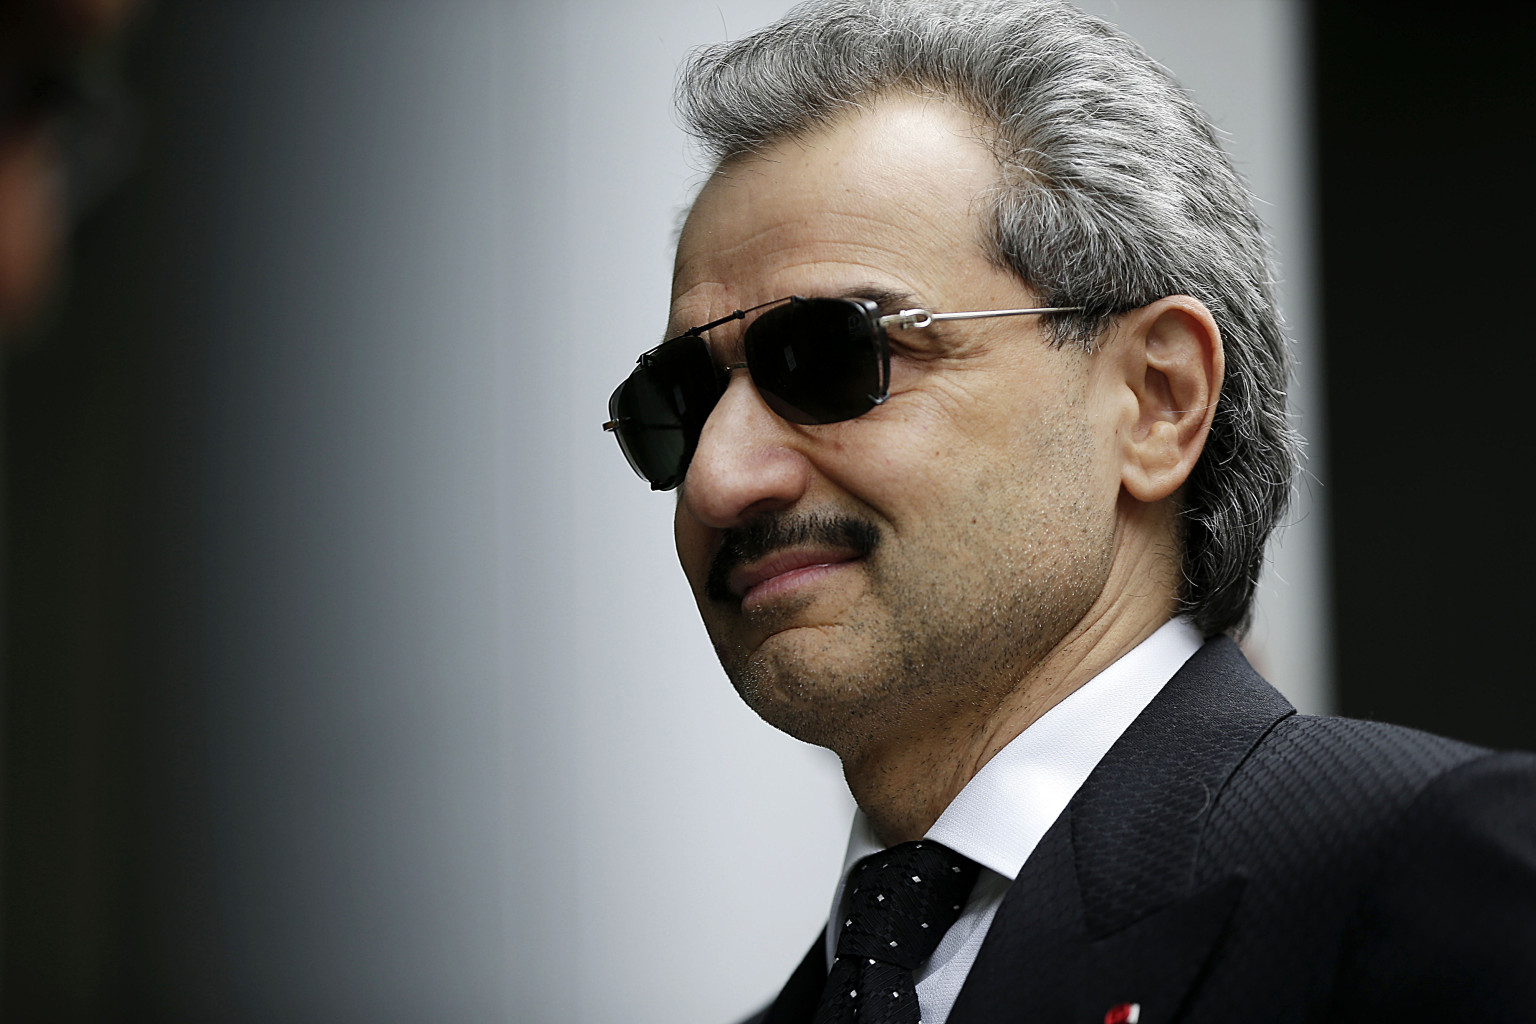 Alwaleed bin Talal: meet the Saudi prince giving away all his money